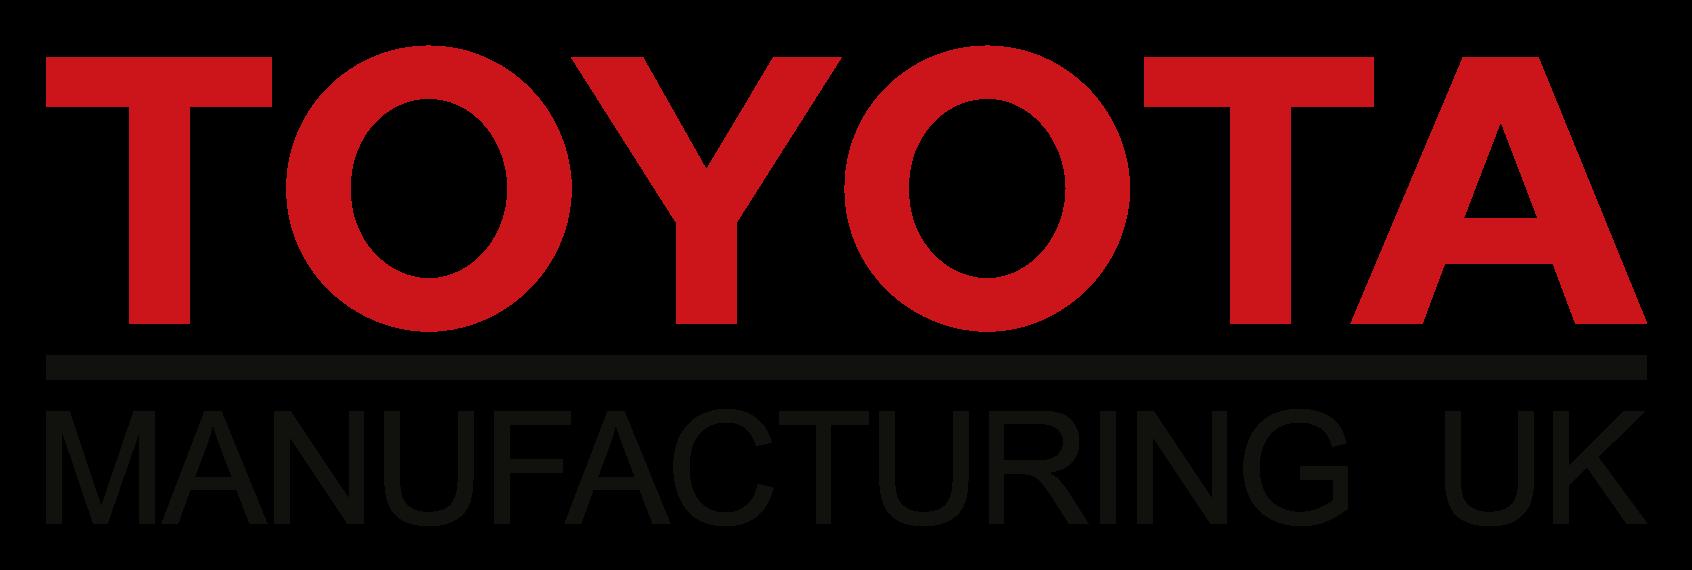 Toyota Manufacturing Logo (No Background)